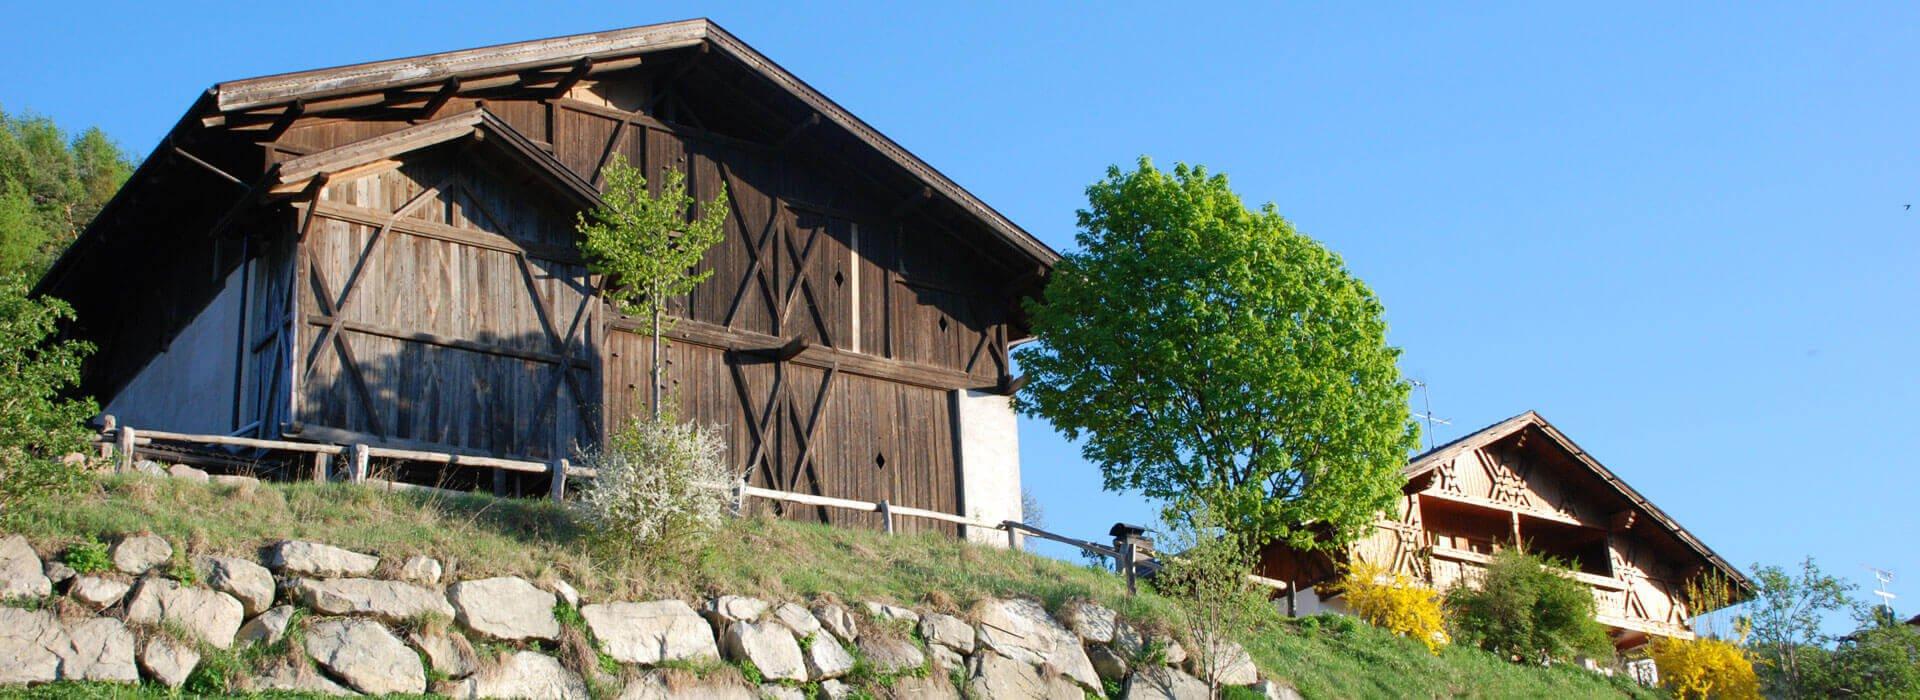 erlebnisbauernhof-moarhof-gufidaun-(2)